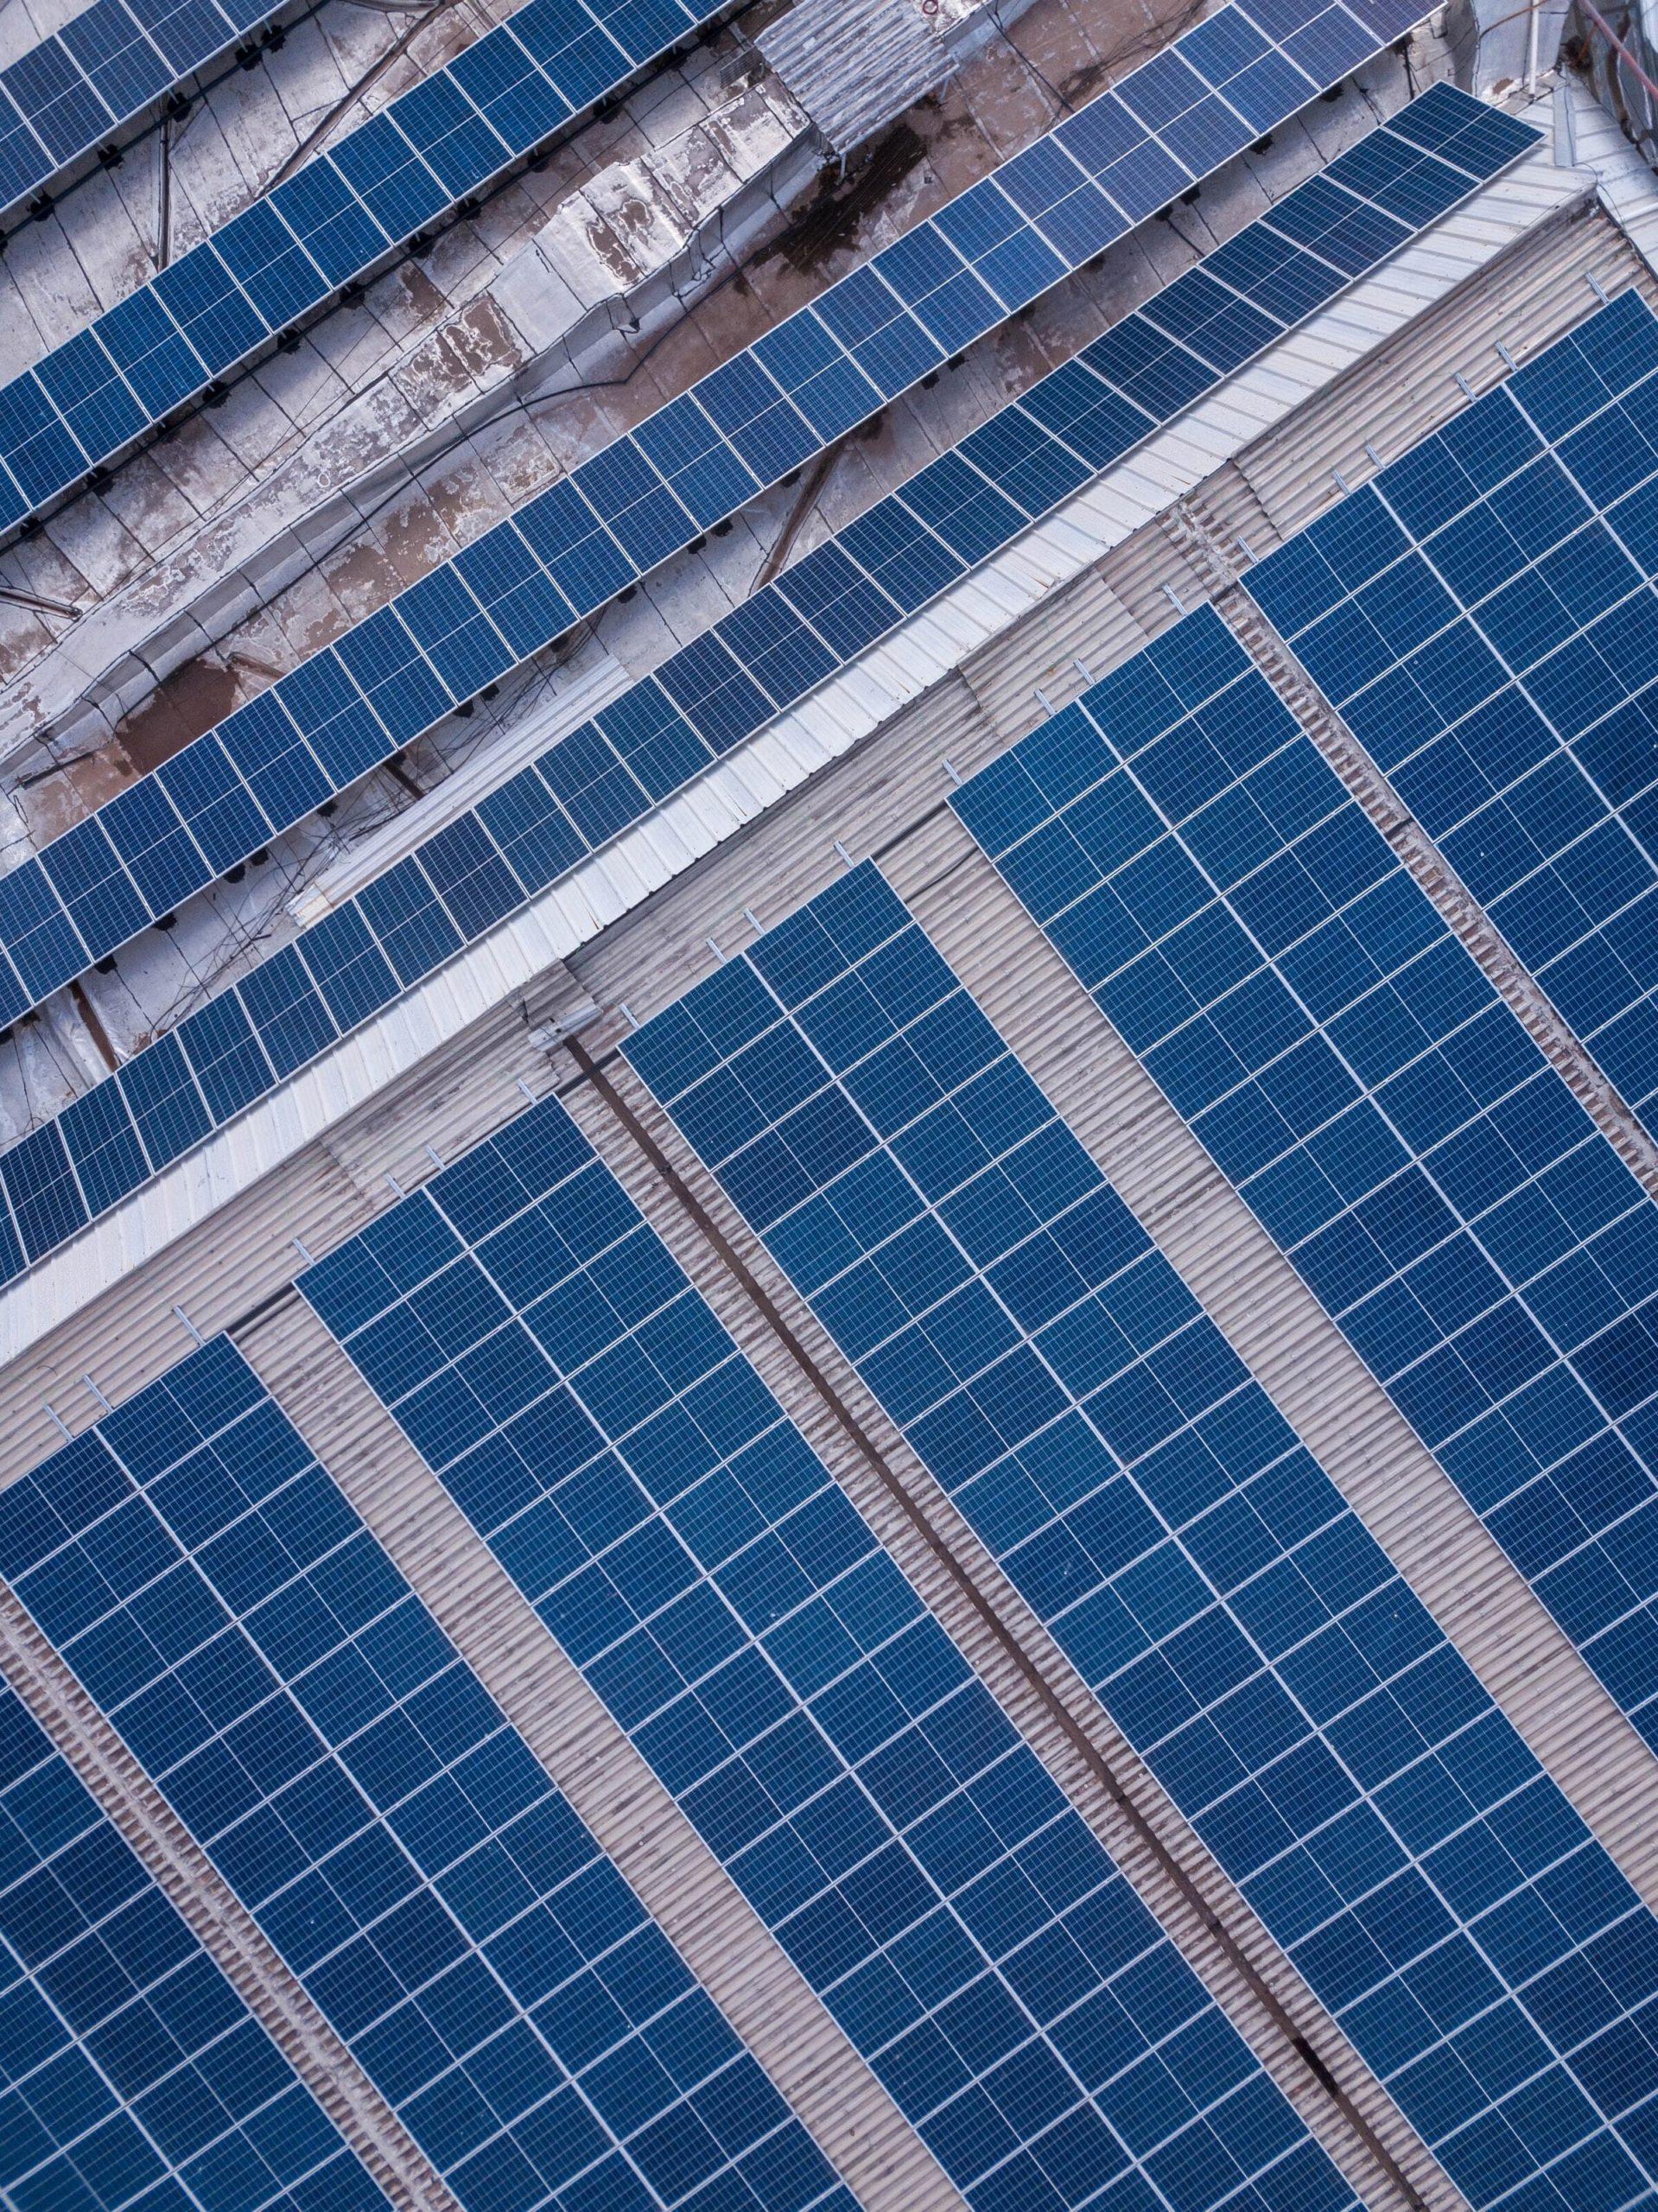 Bedford Leads in Municipal Community Solar Adoption